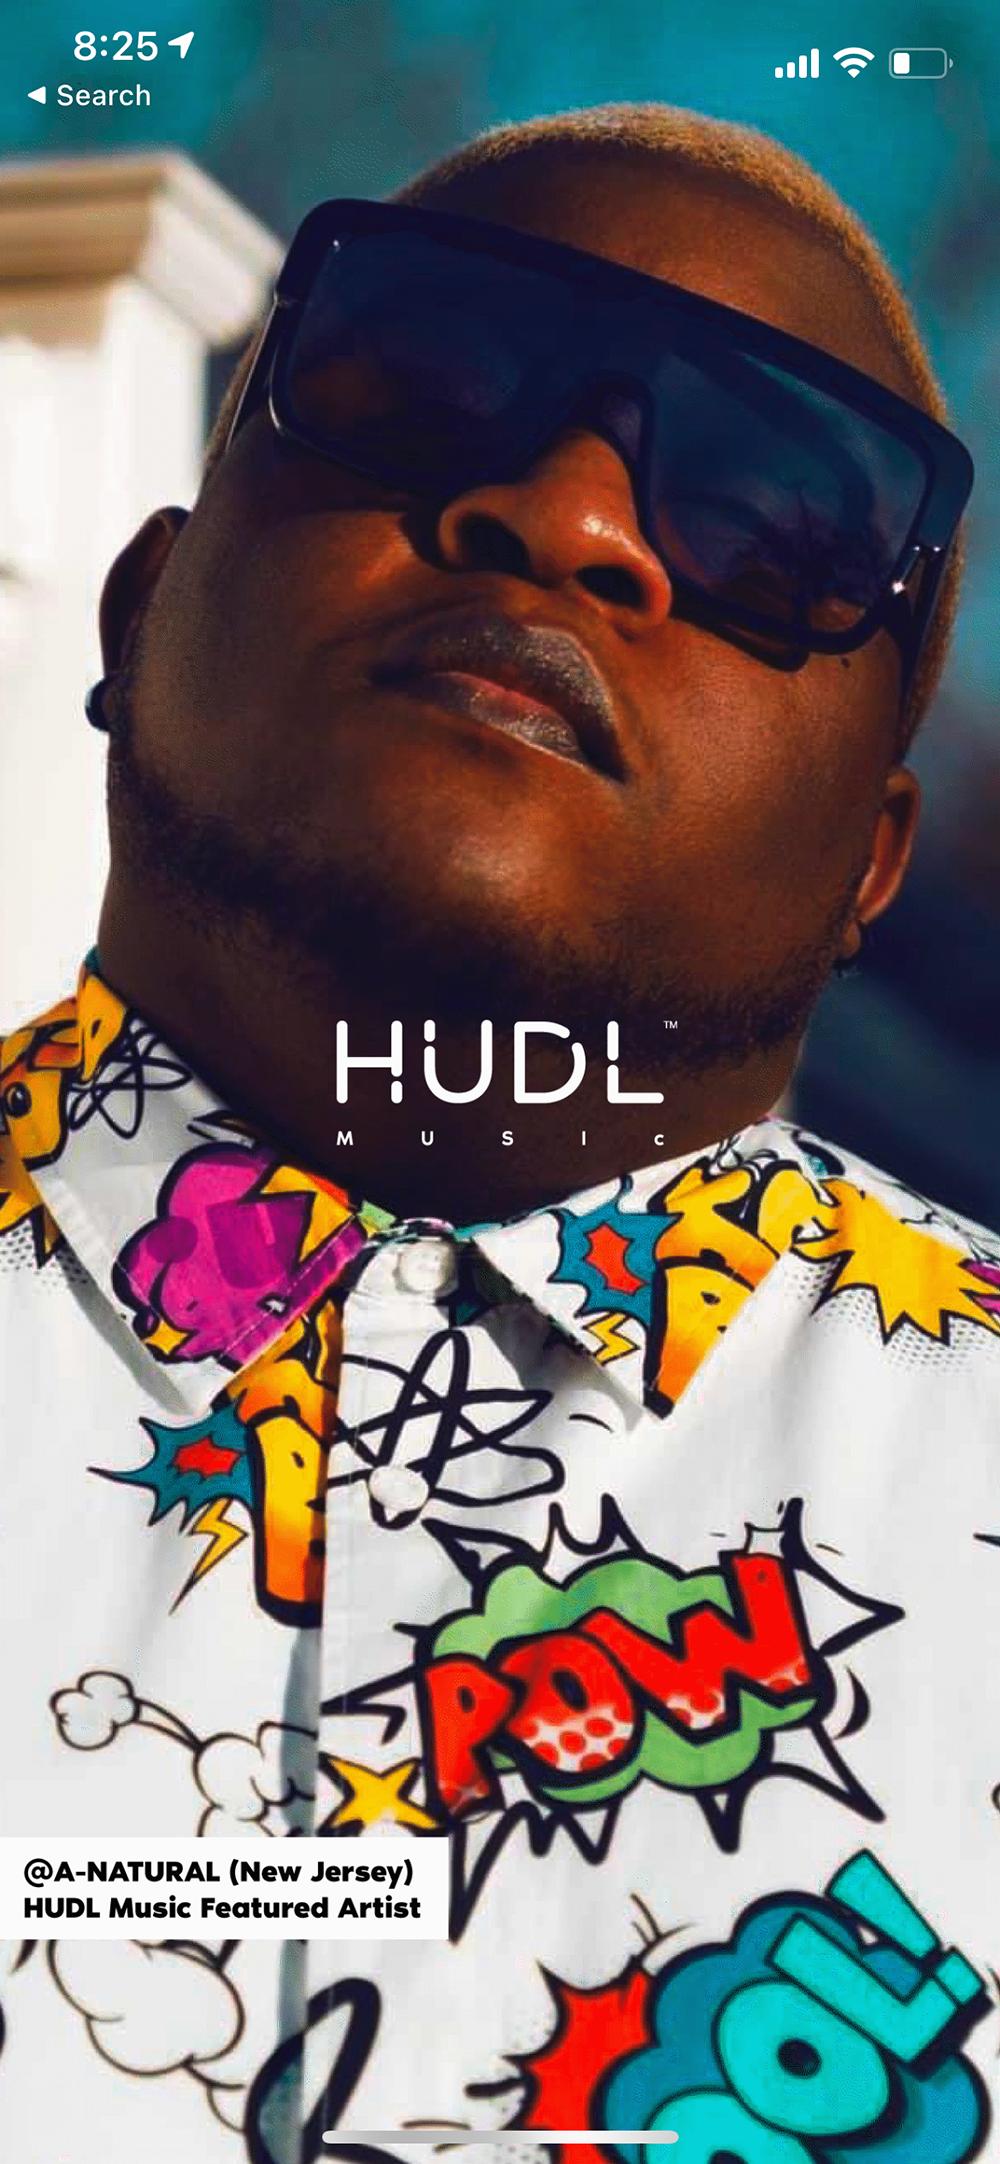 HUDL Music iPhone App